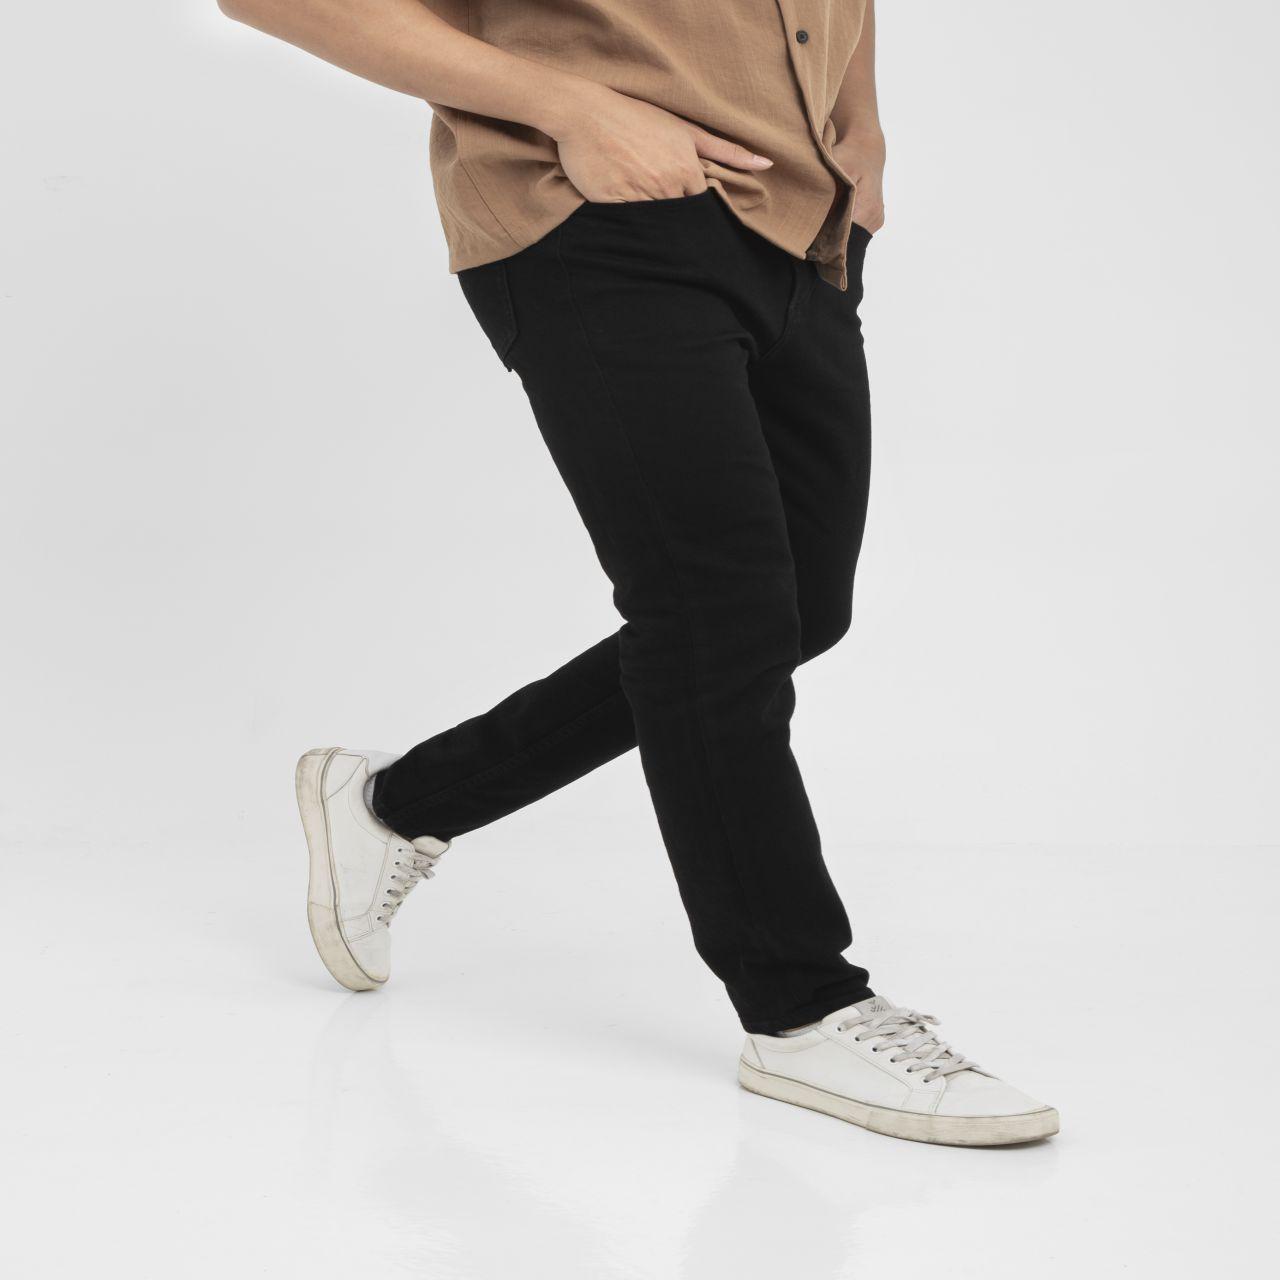 SP347 - Quần Jeans Basic Skinny Fit Black